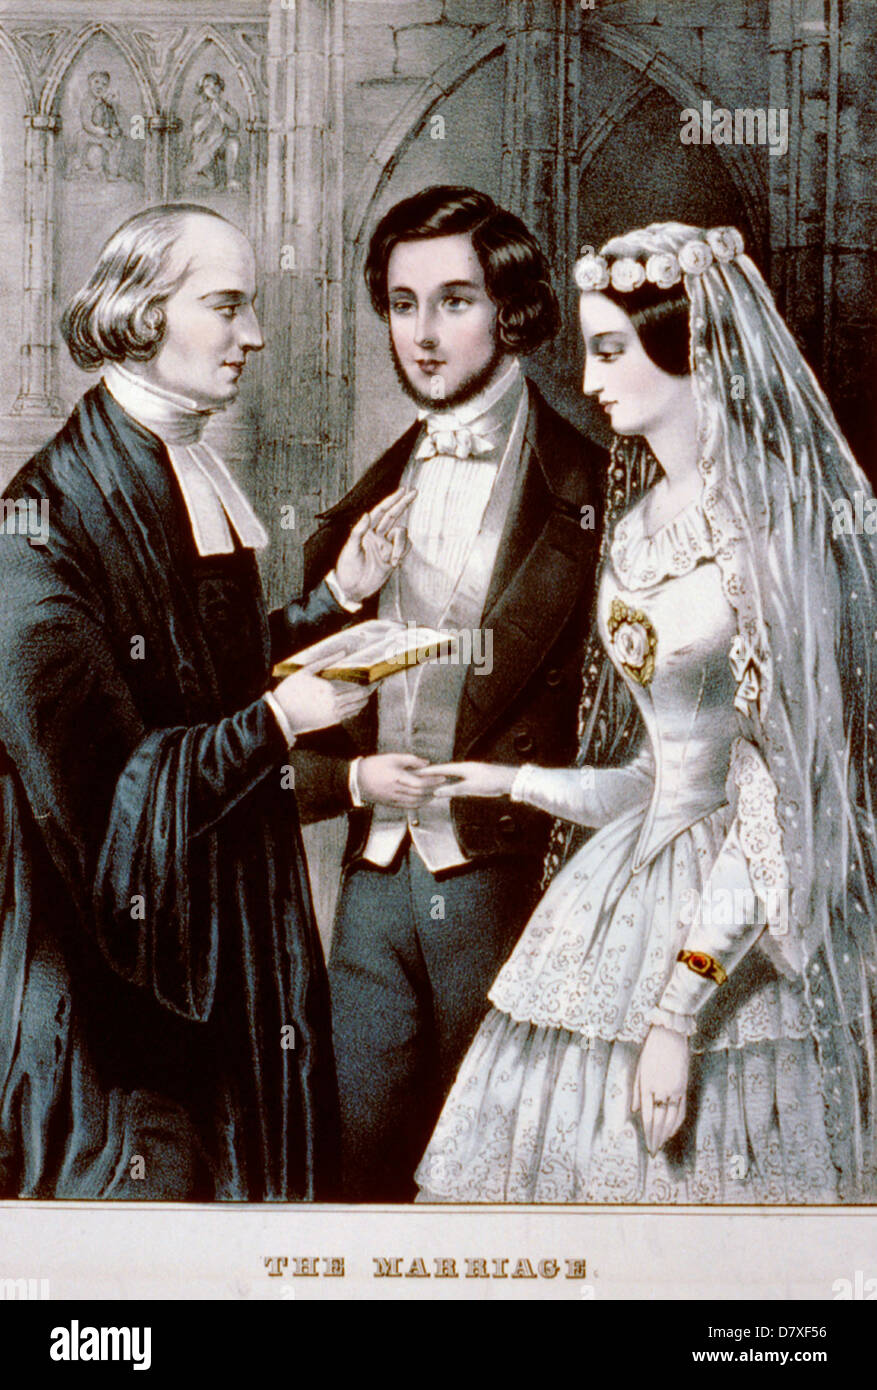 The Marriage - lithograph, circa 1847 - Stock Image